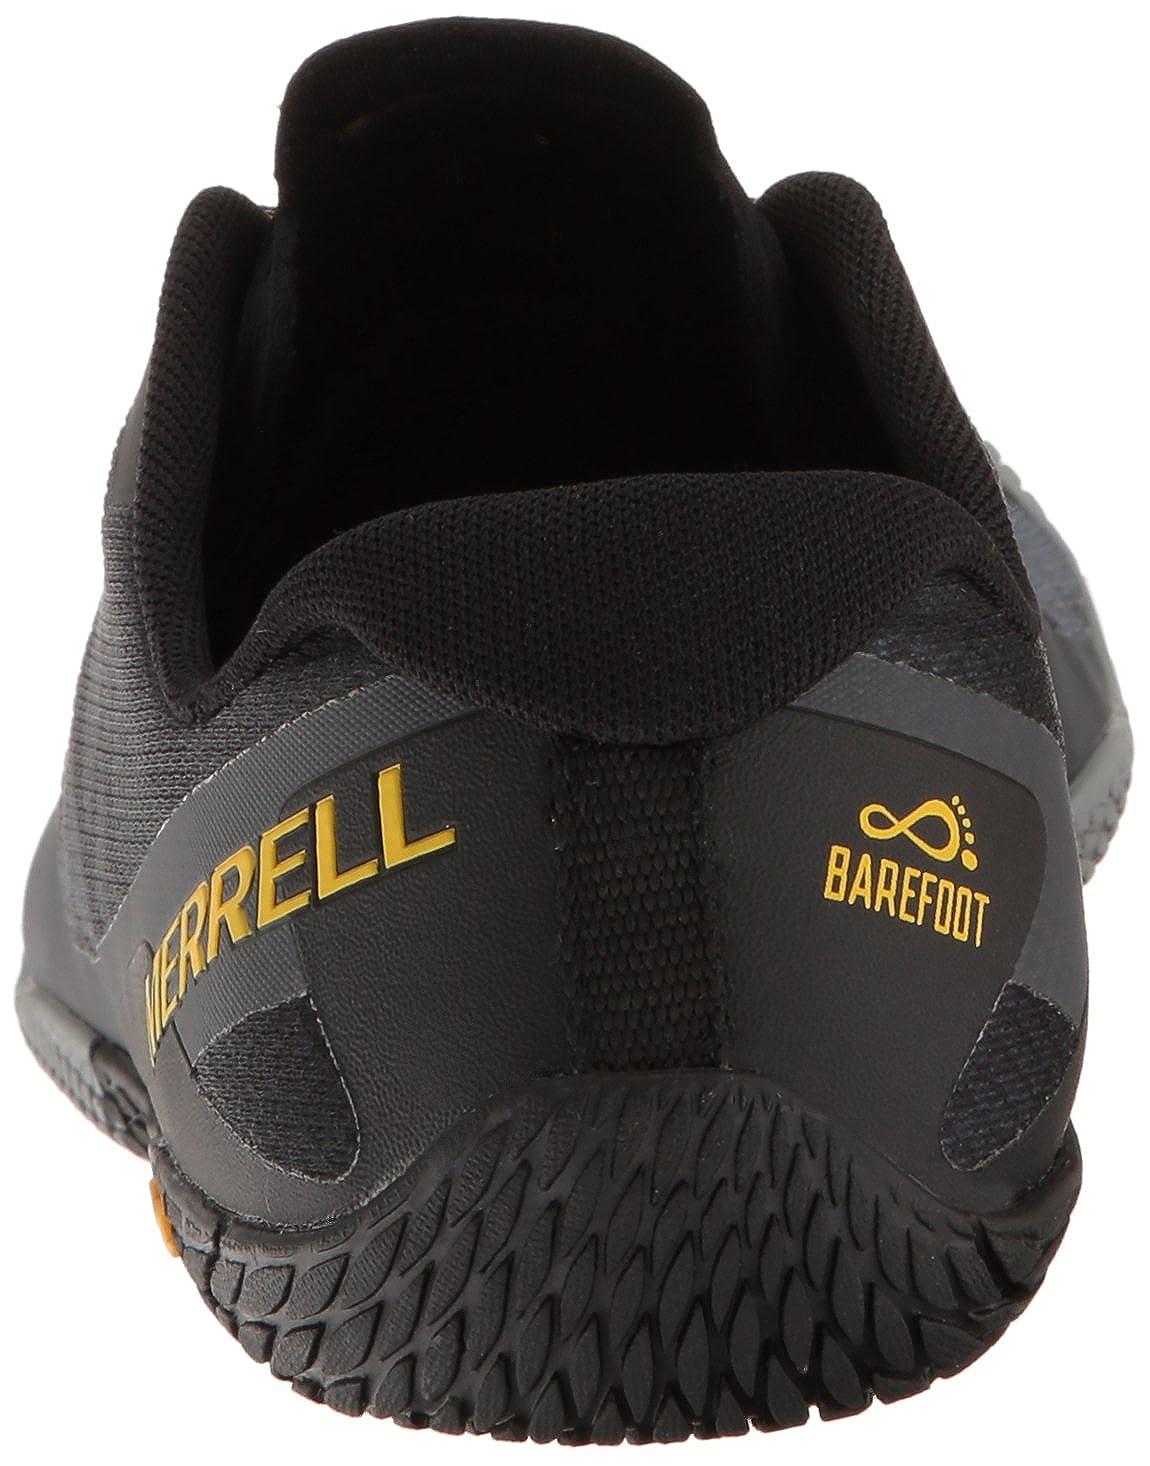 Merrell Vapor Glove 3, Scarpe Scarpe Scarpe Running Uomo | Materiali selezionati  1c1564